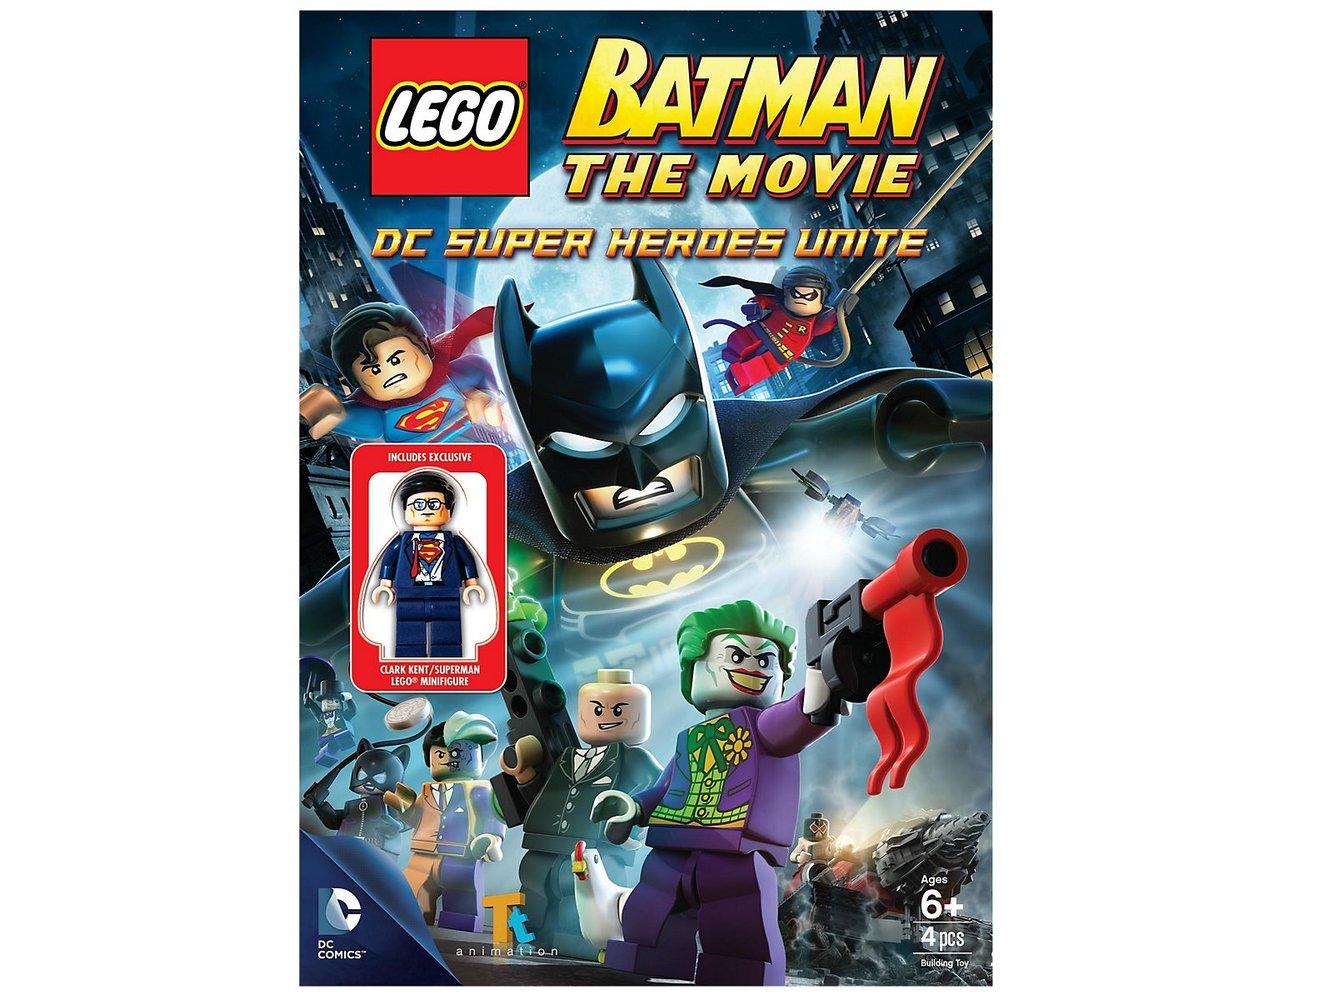 Batman The Movie - DC Super Heroes Unite (DVD)